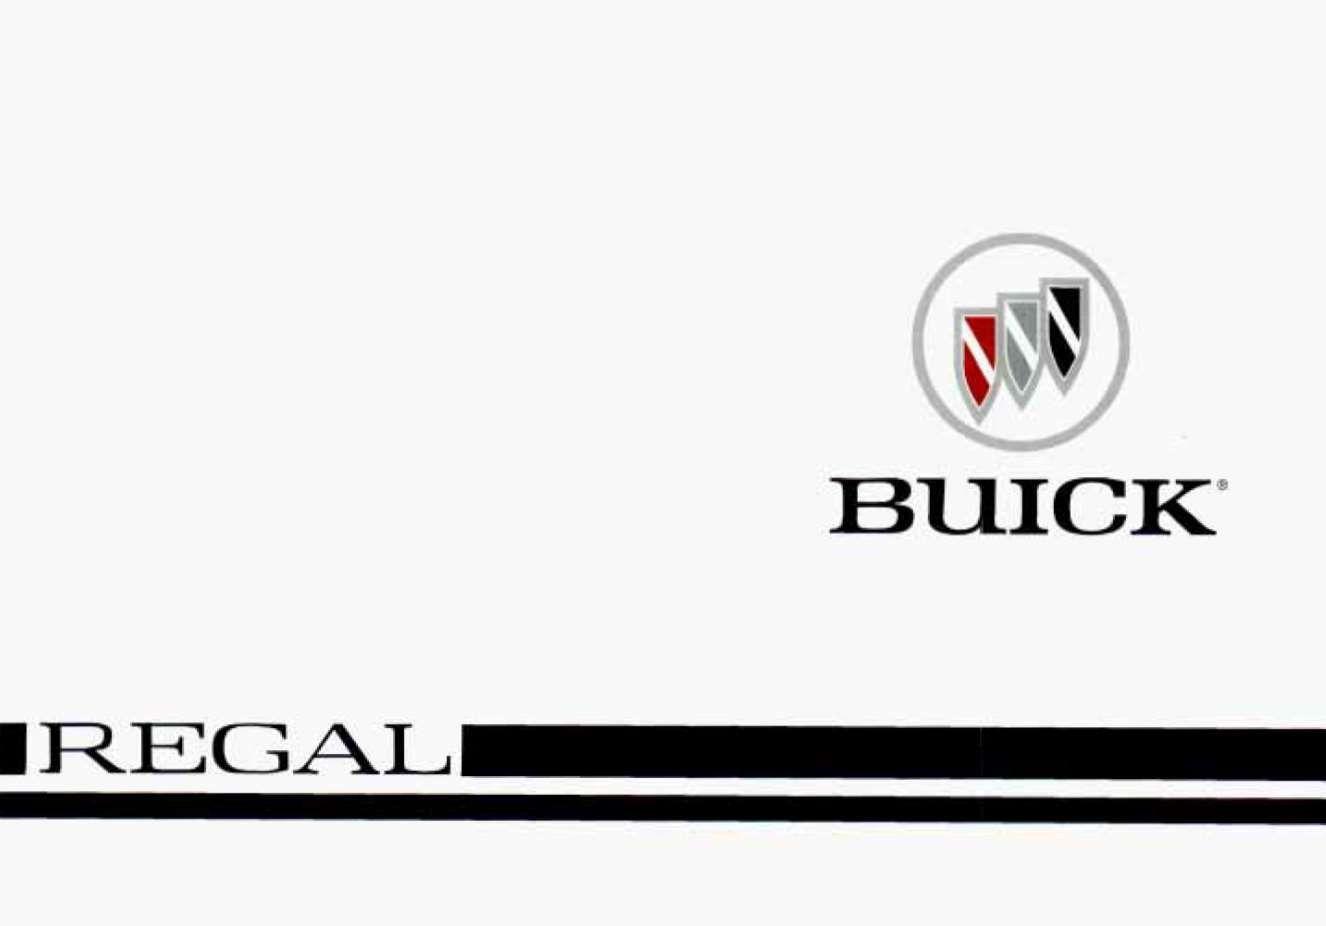 Buick Regal 1996 Owner S Manual Pdf Online Download Buick Regal Buick Owners Manuals